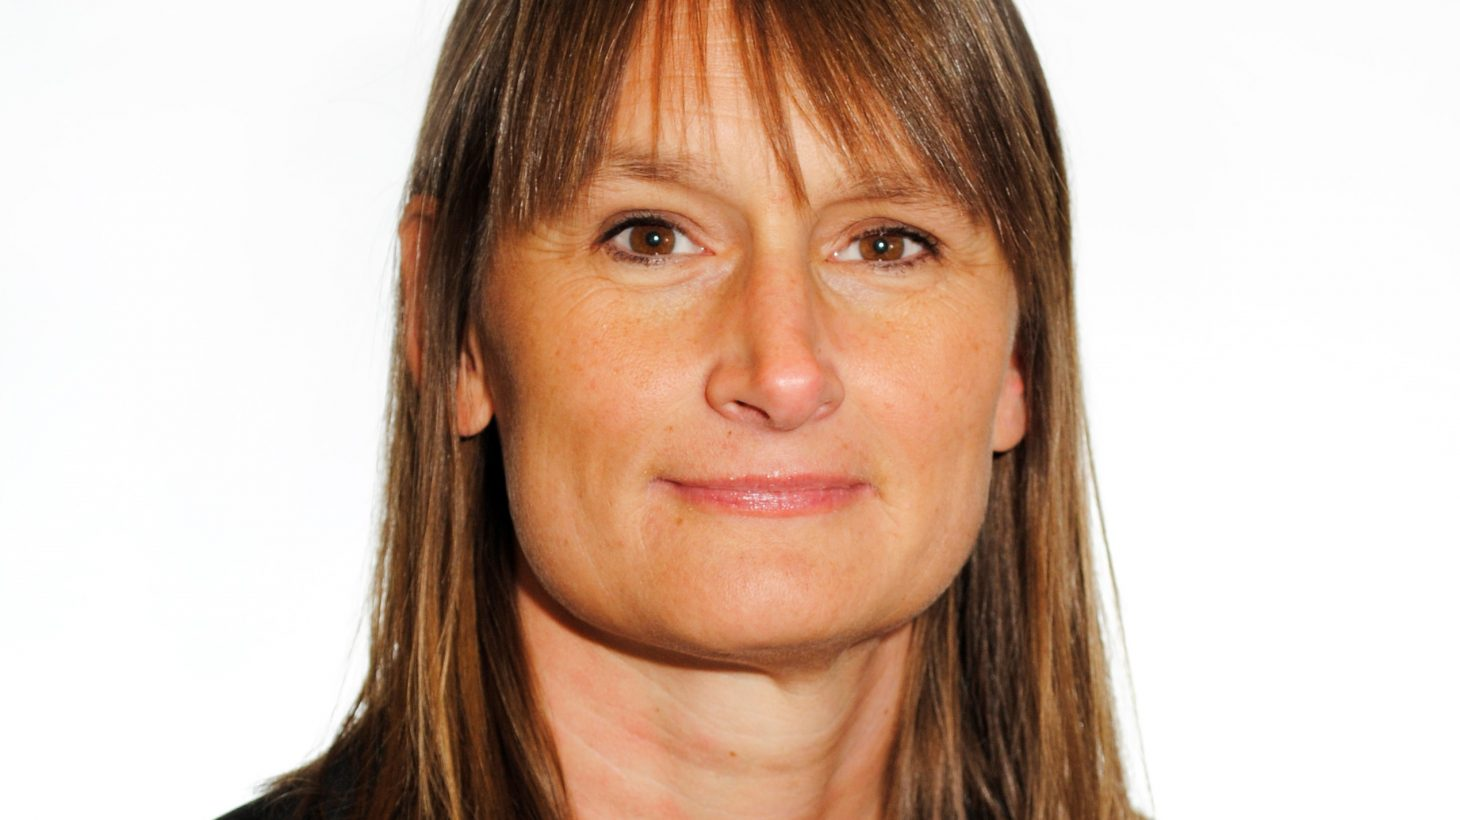 Johanna Karlén på porträttbild